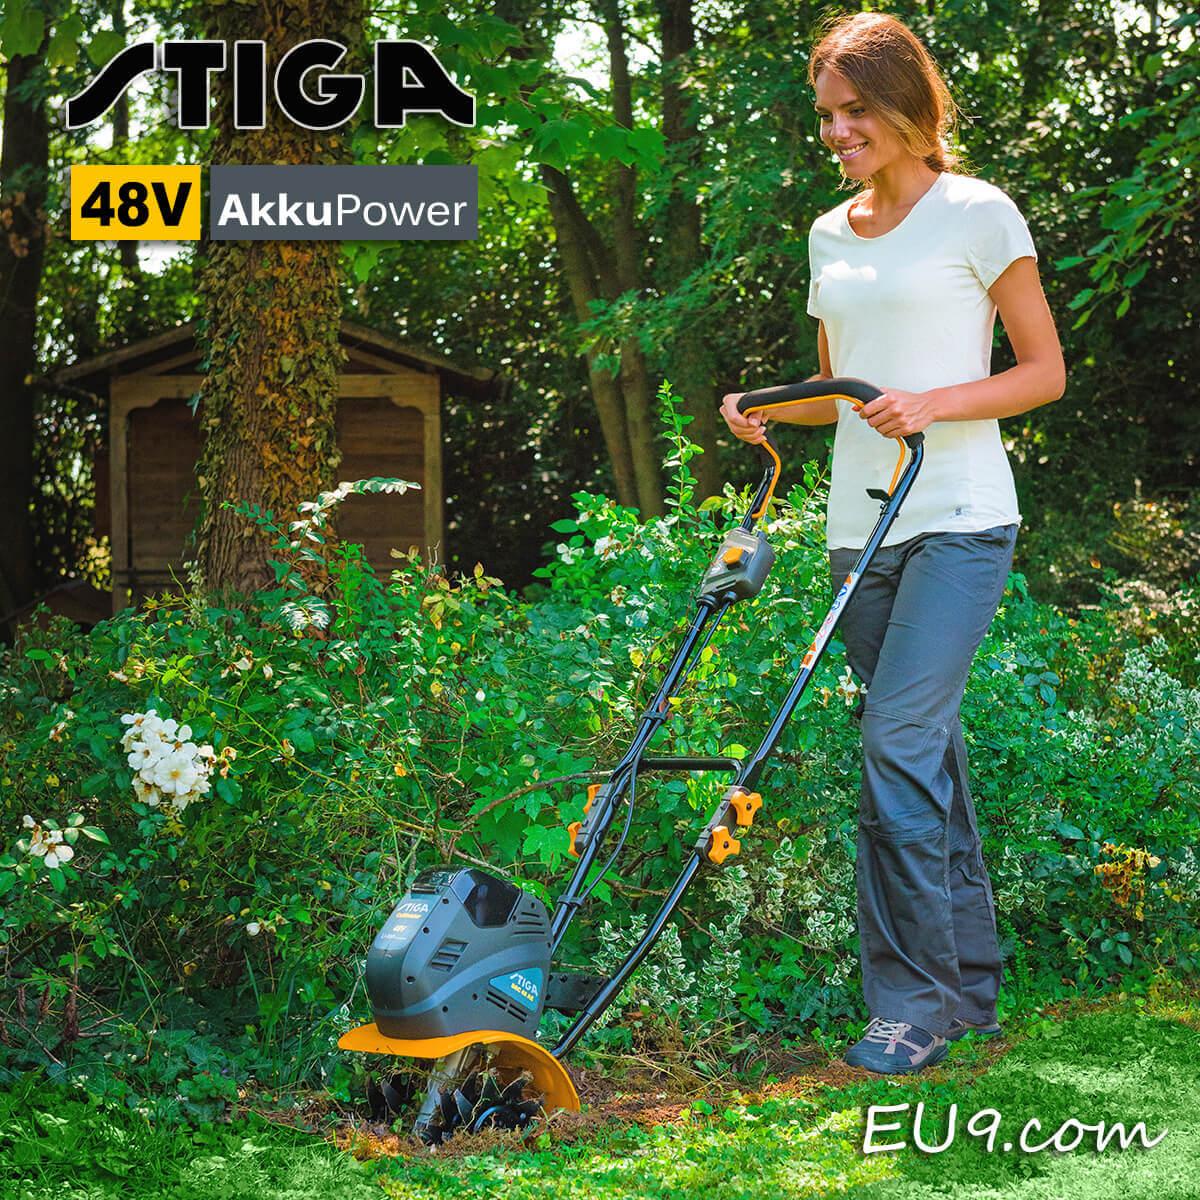 stiga src 48 ae 48v akku-motorhacke - 48 volt | günstig bei eu9 kaufen!